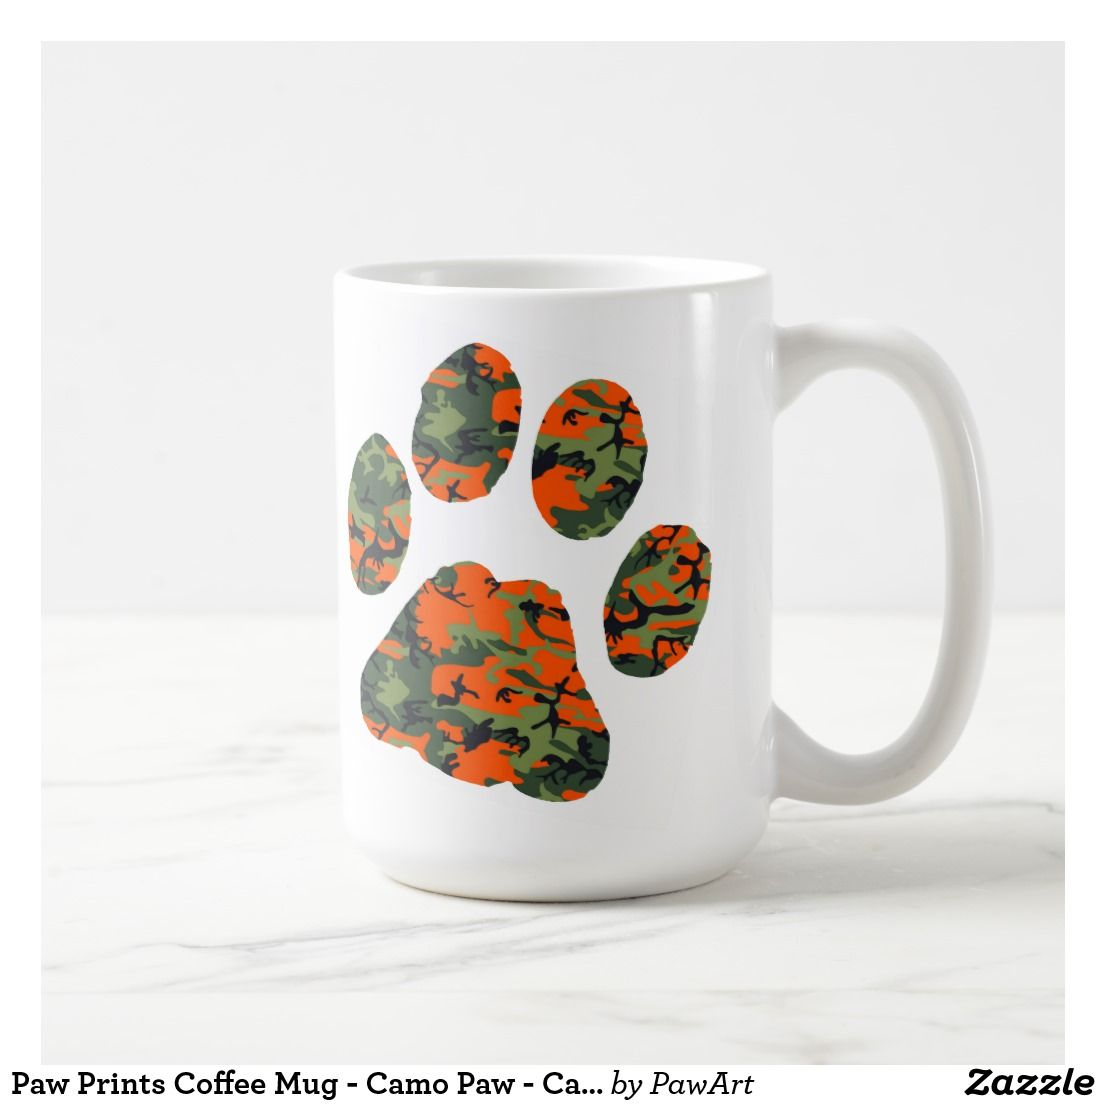 Paw Prints Coffee Mug Camo Paw Camouflage